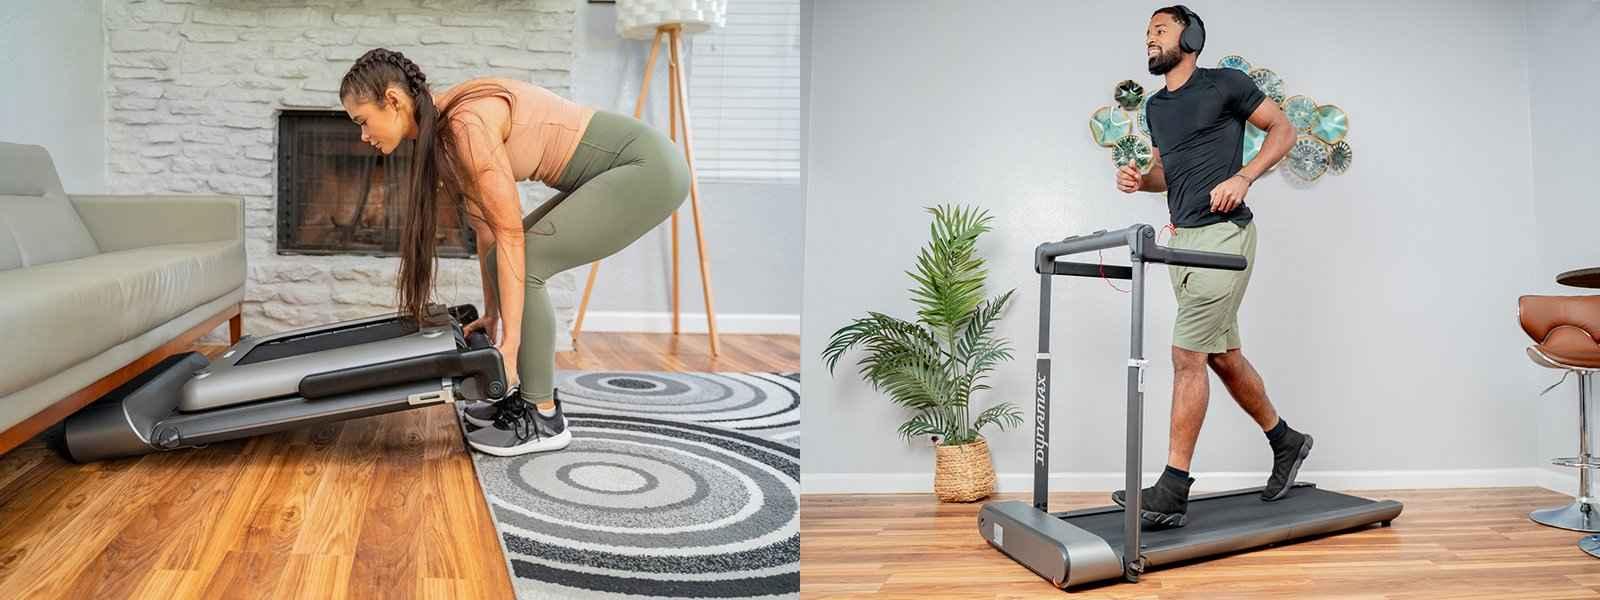 Platzsparende Fitnessgeräte